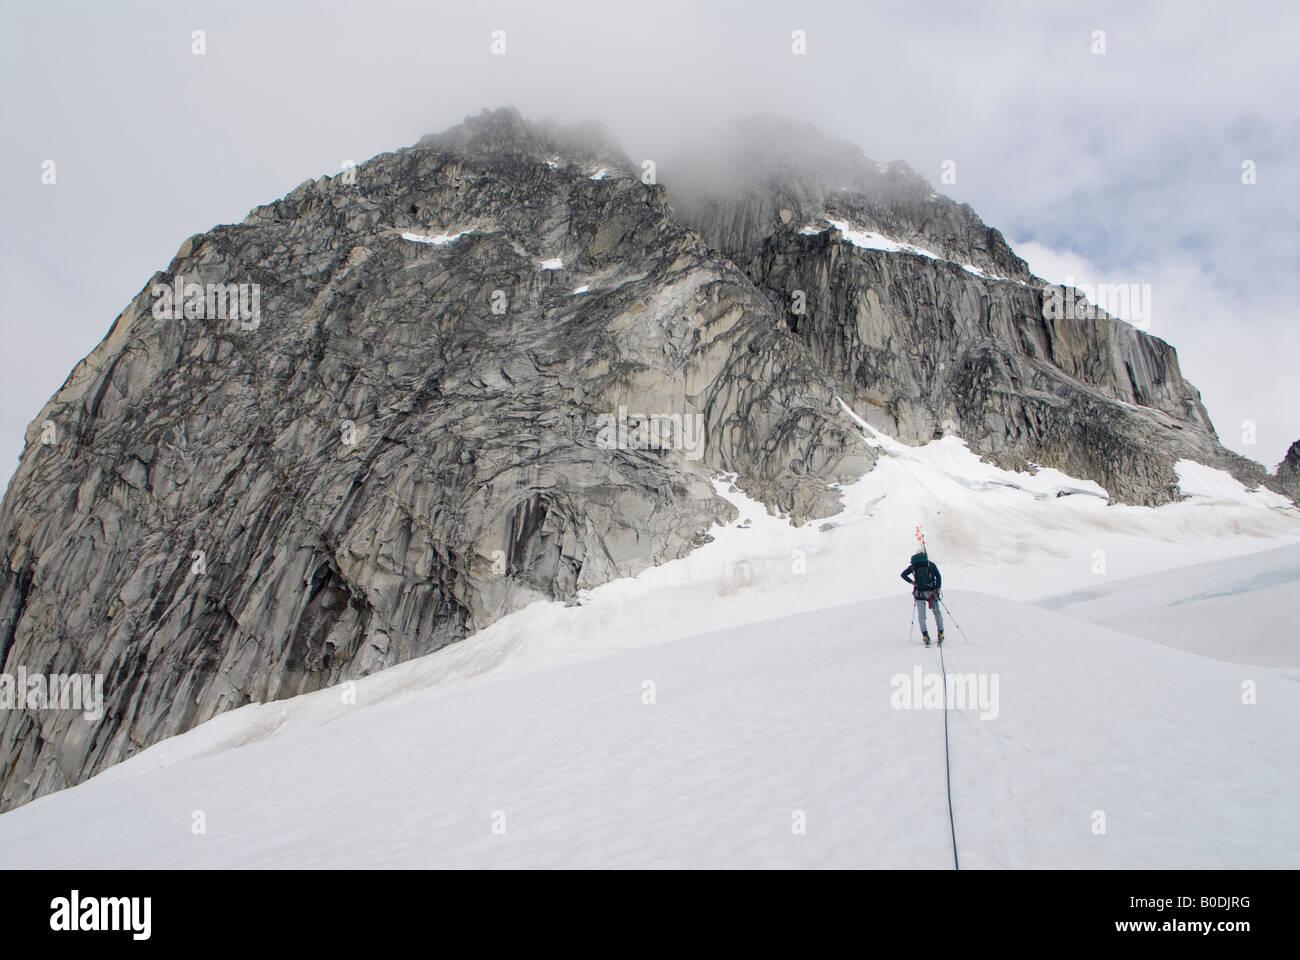 Ski approach to The Throne, Little Switzerland, Pika Glacier, Alaska - Stock Image